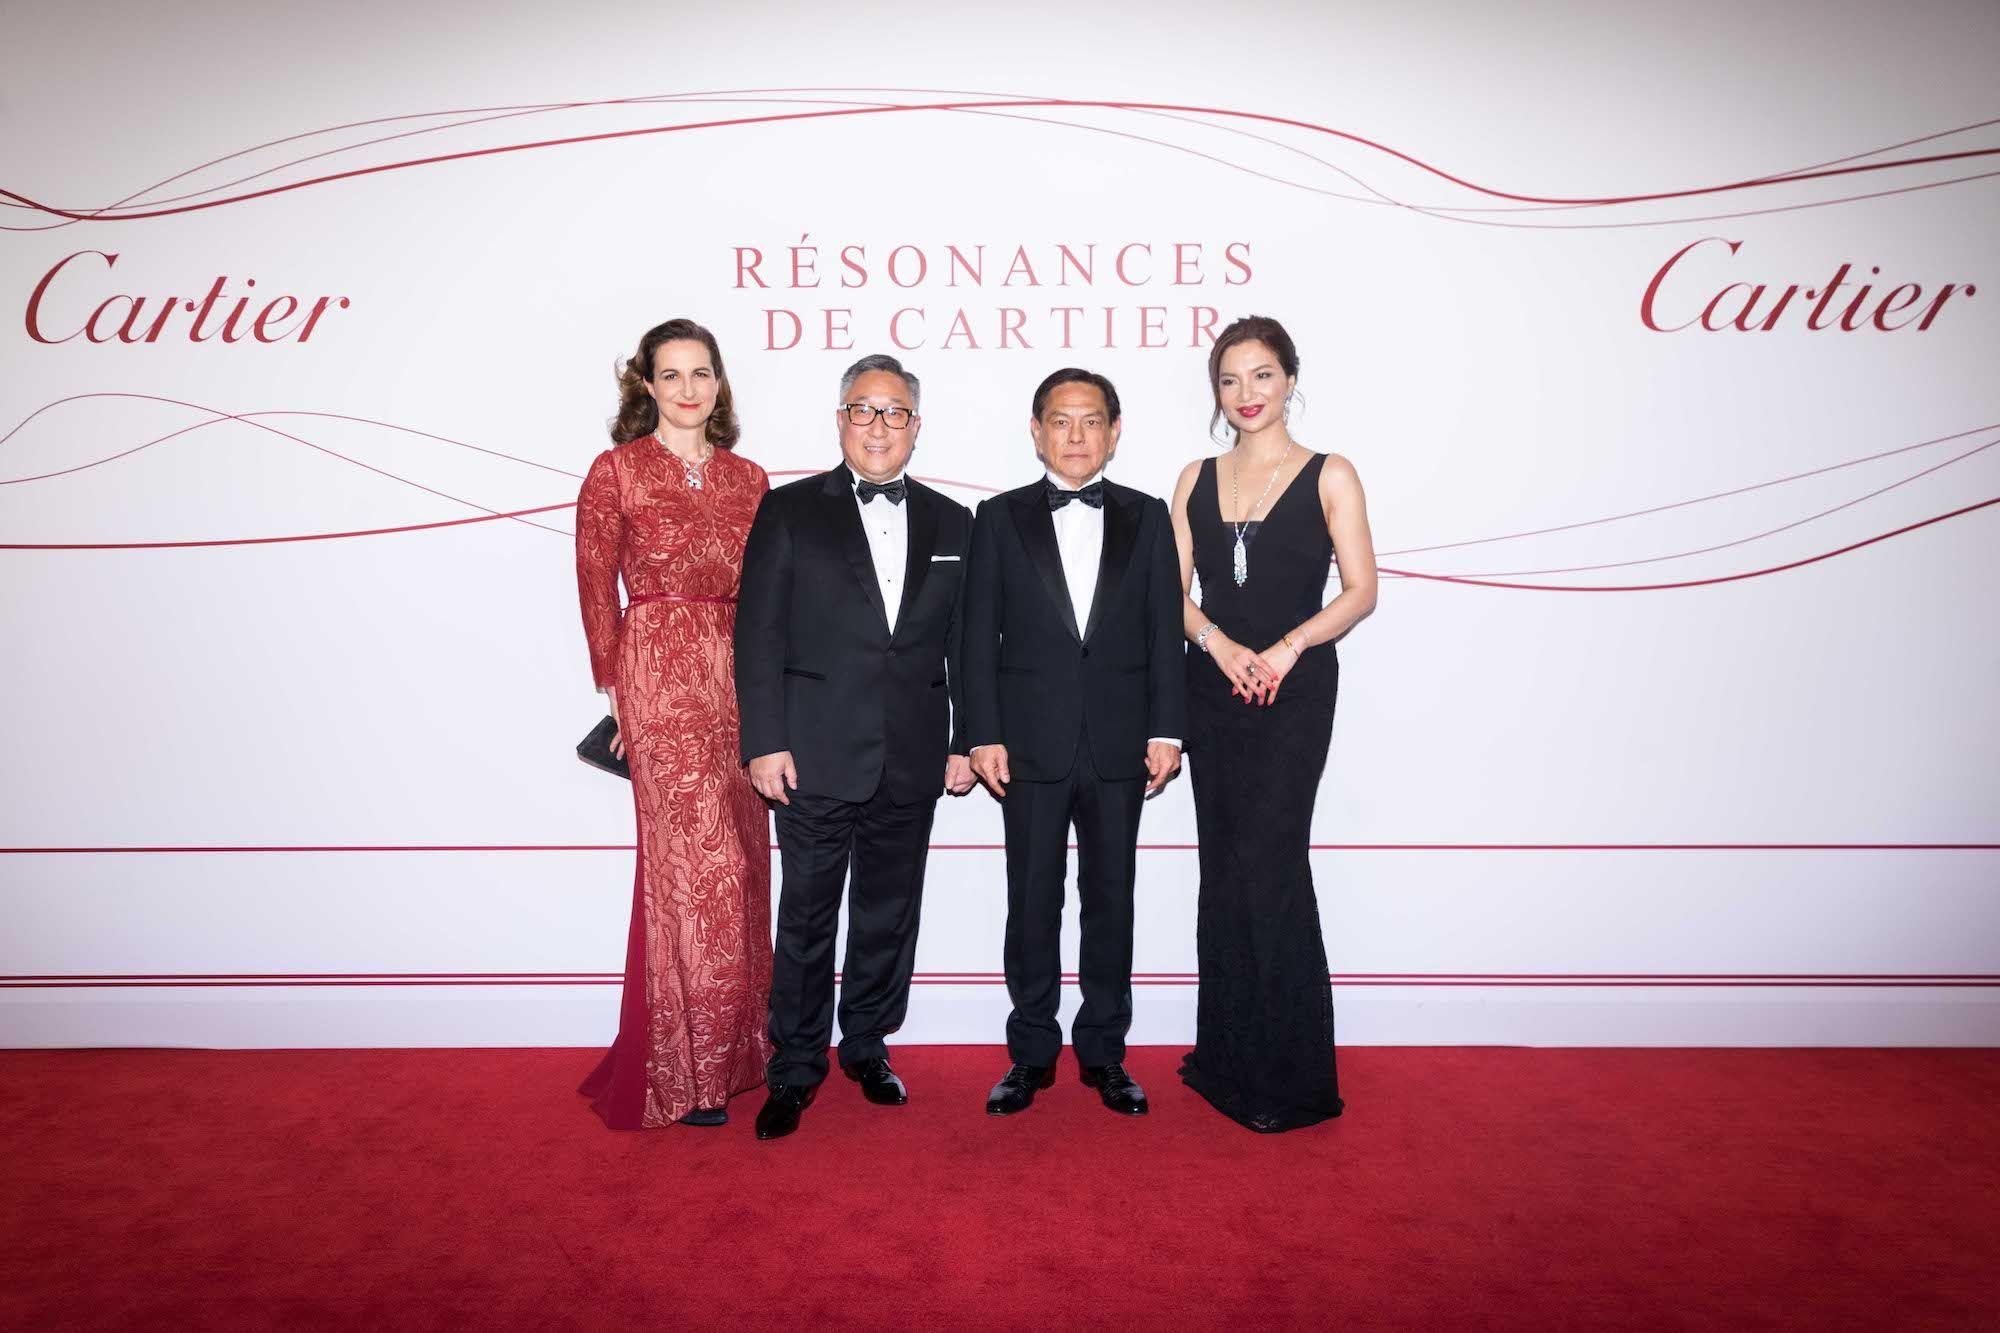 Chloe Jay, Nigel Luk, Charles Ho, Peggy Hu